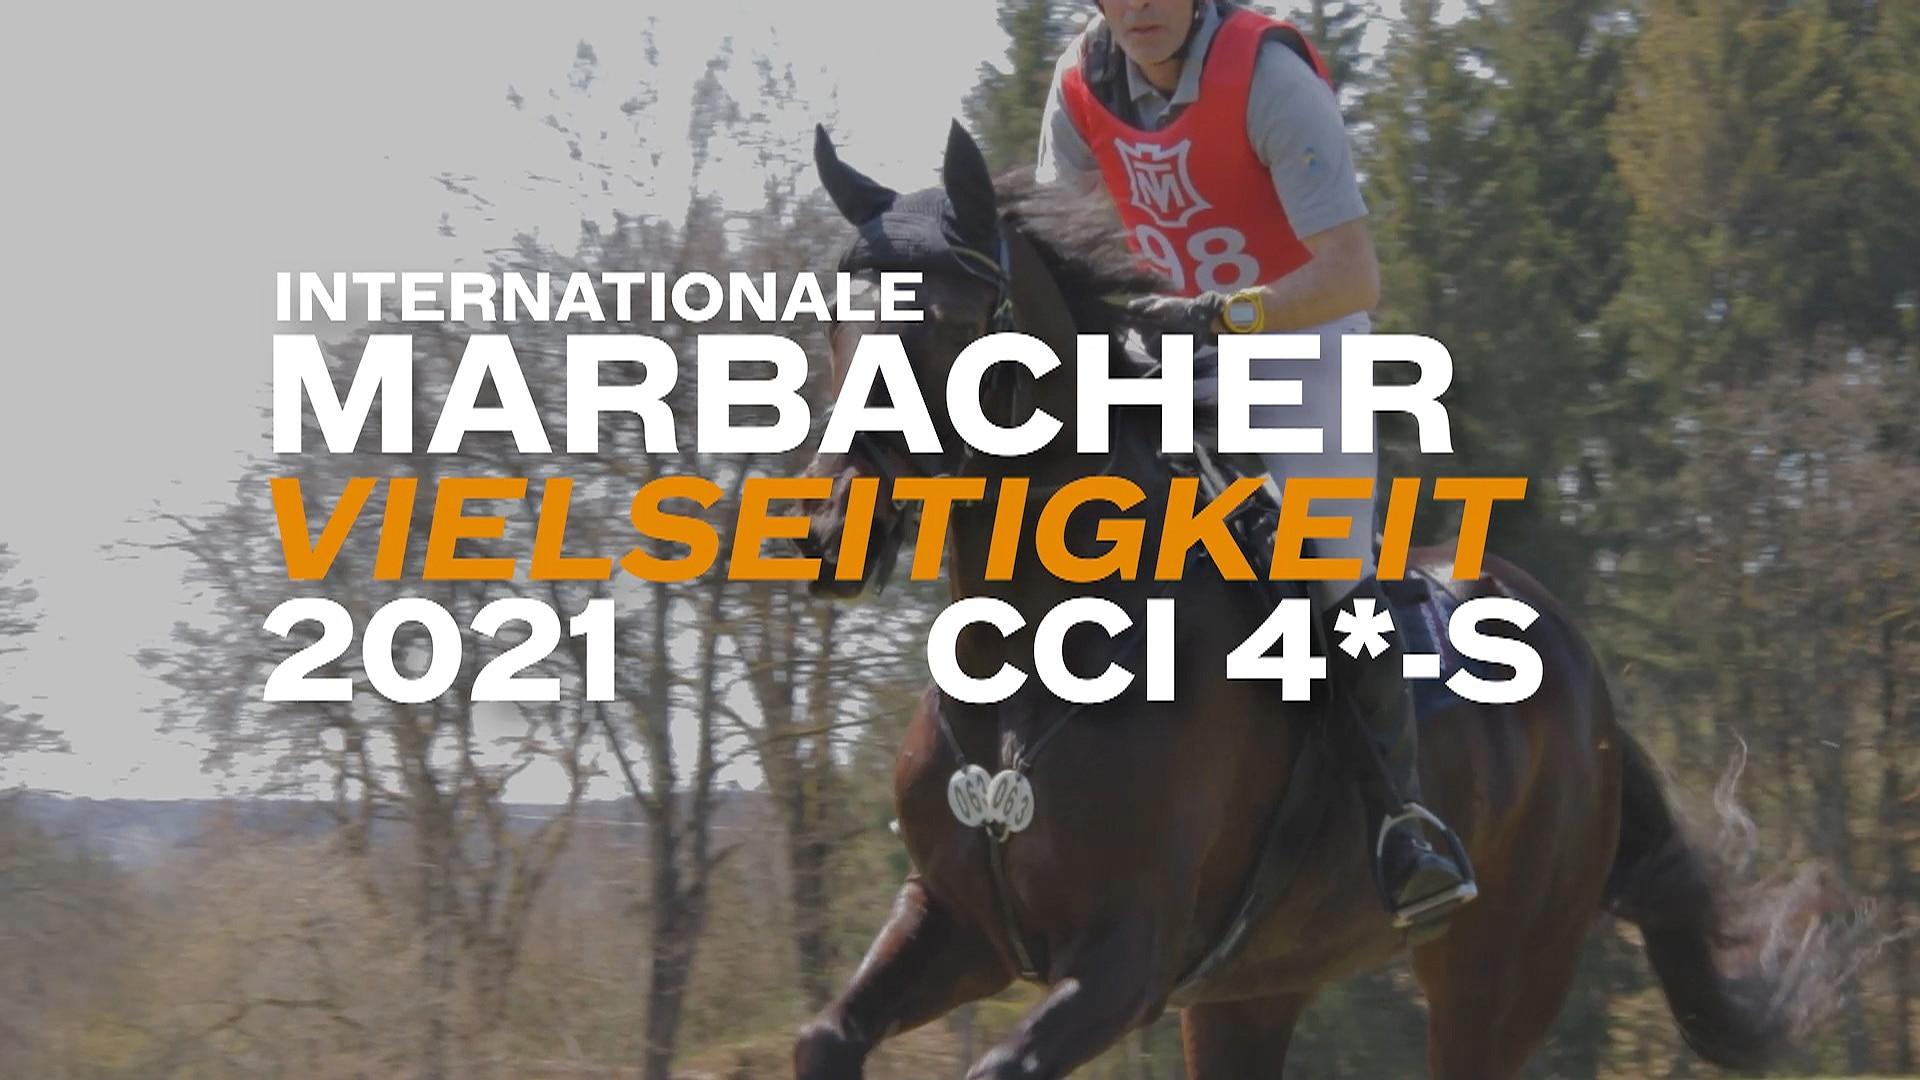 Internationale Marbacher 2021